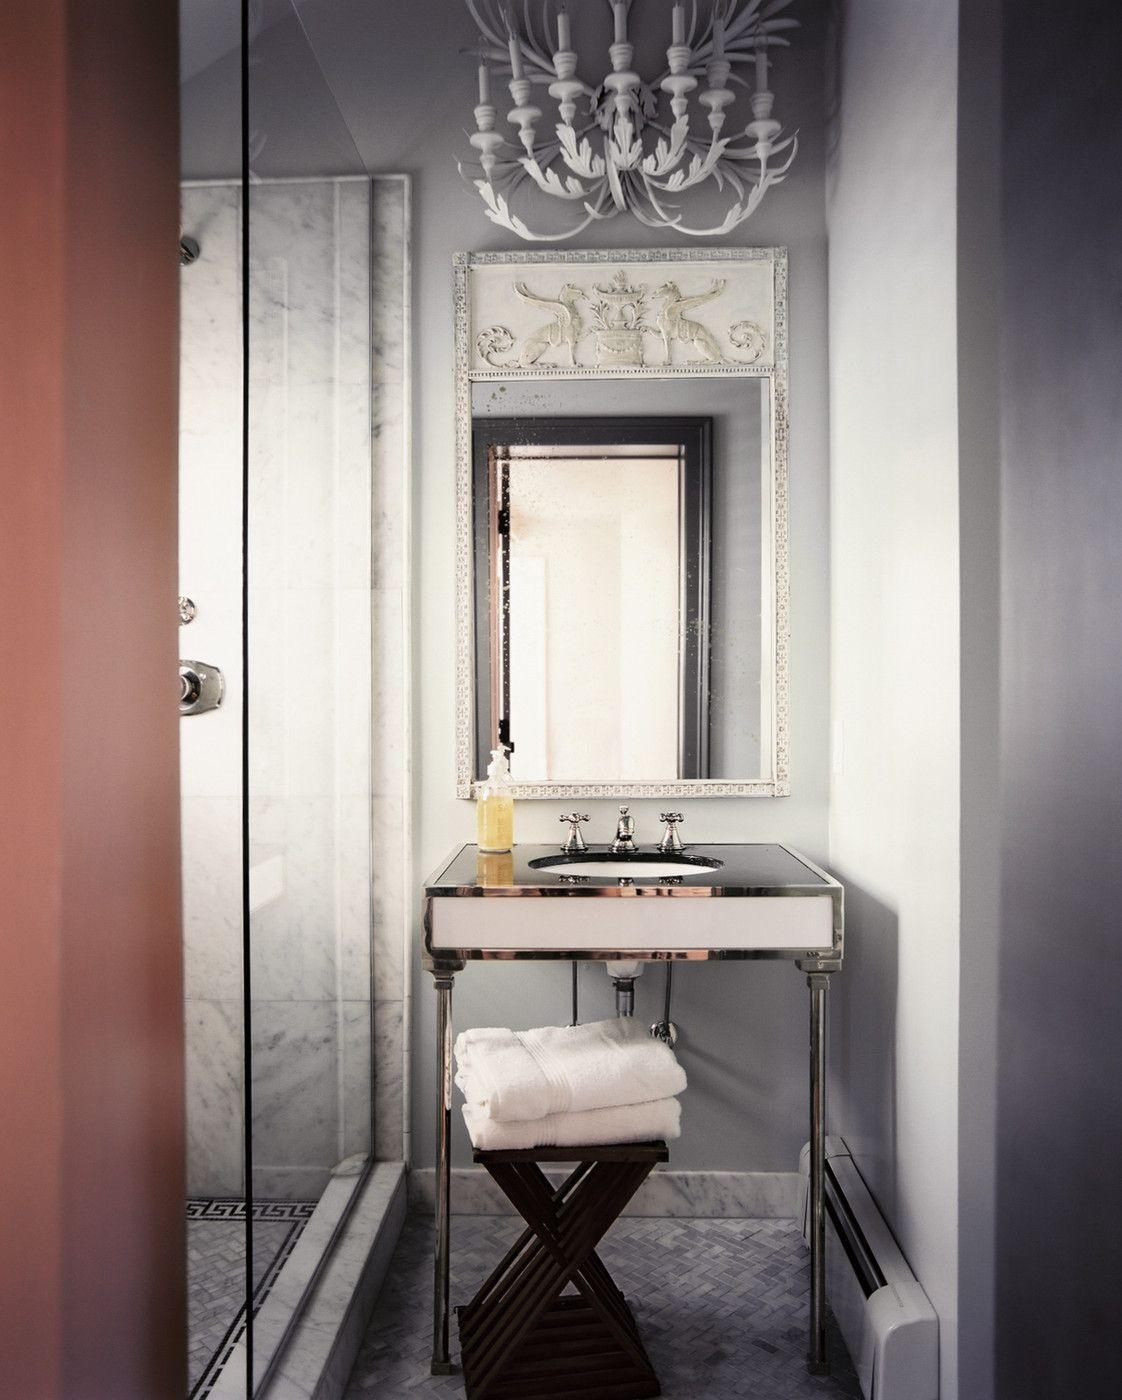 "Foto: Reprodução / <a href=""http://www.lonny.com/photos/Bathroom/XYUK7AG7g2l"" target=""_blank""> Lonny </a>"